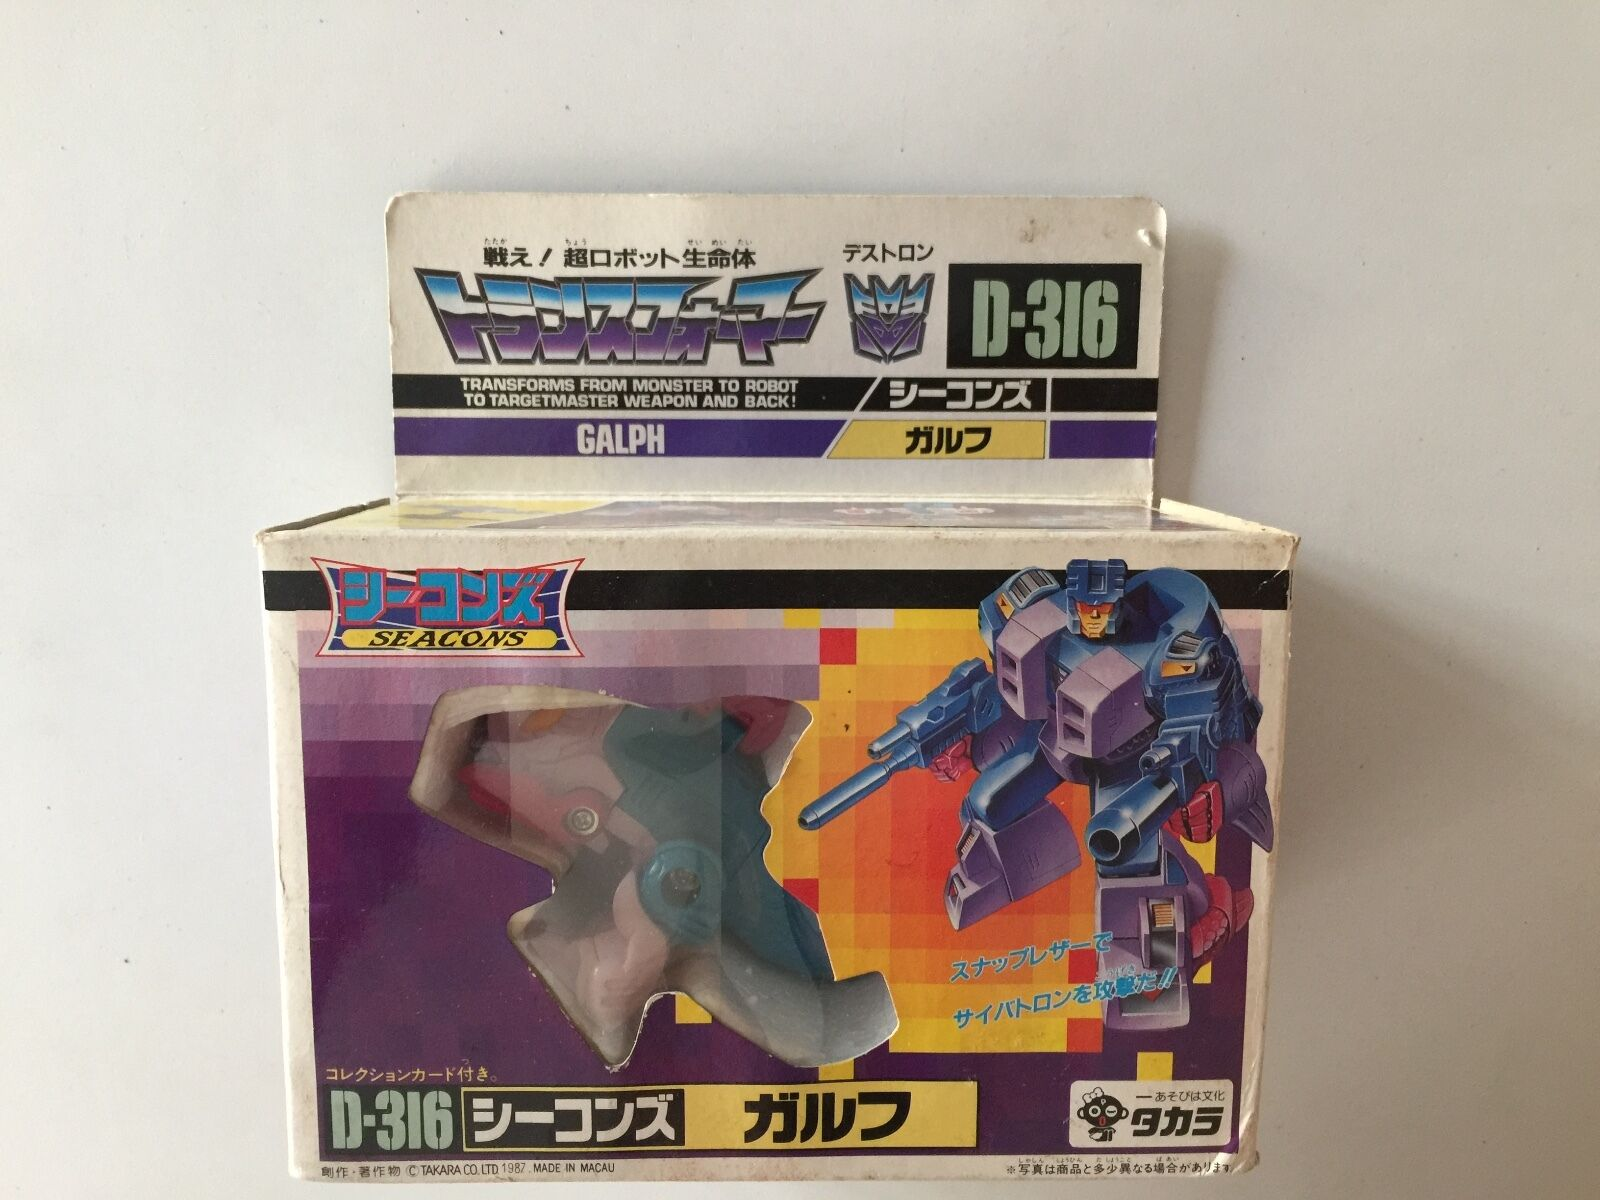 Transformers G1 1987 D-316 GALPH skalor  MIB seacon piranacon TAKARA japan